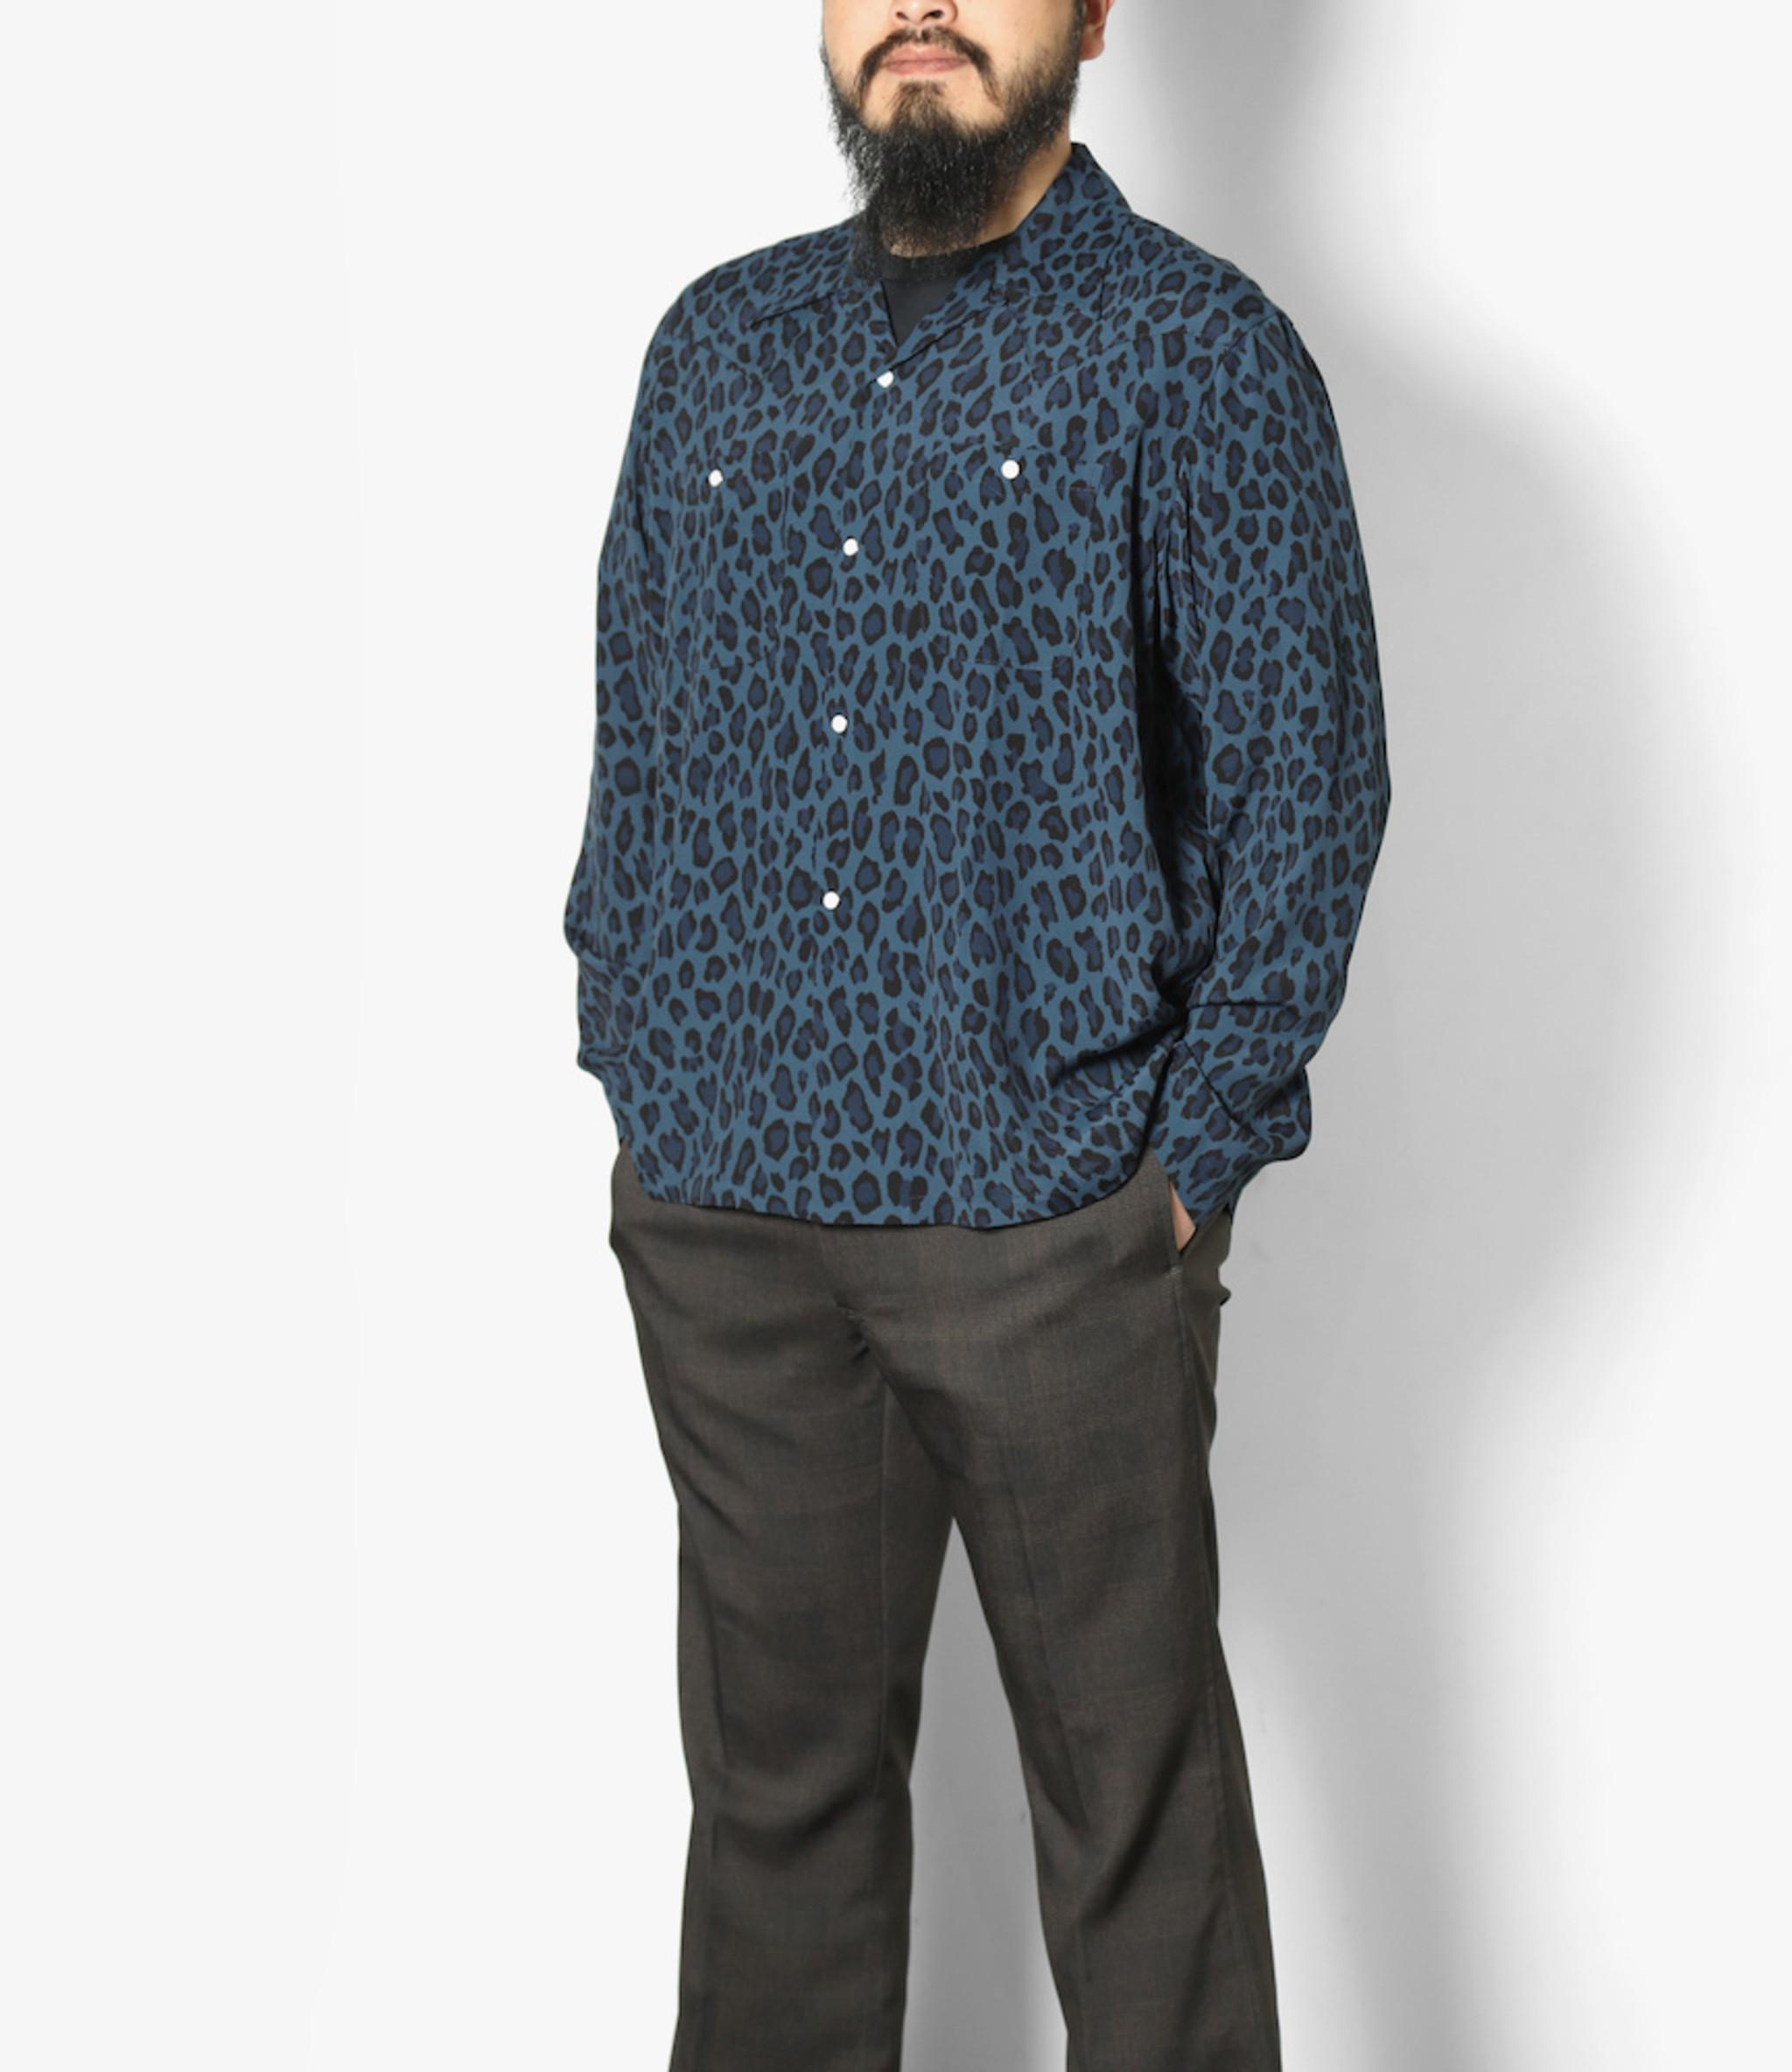 Needles One-up Cowboy Shirt - Rayon Cloth / Leopard Print - Blue